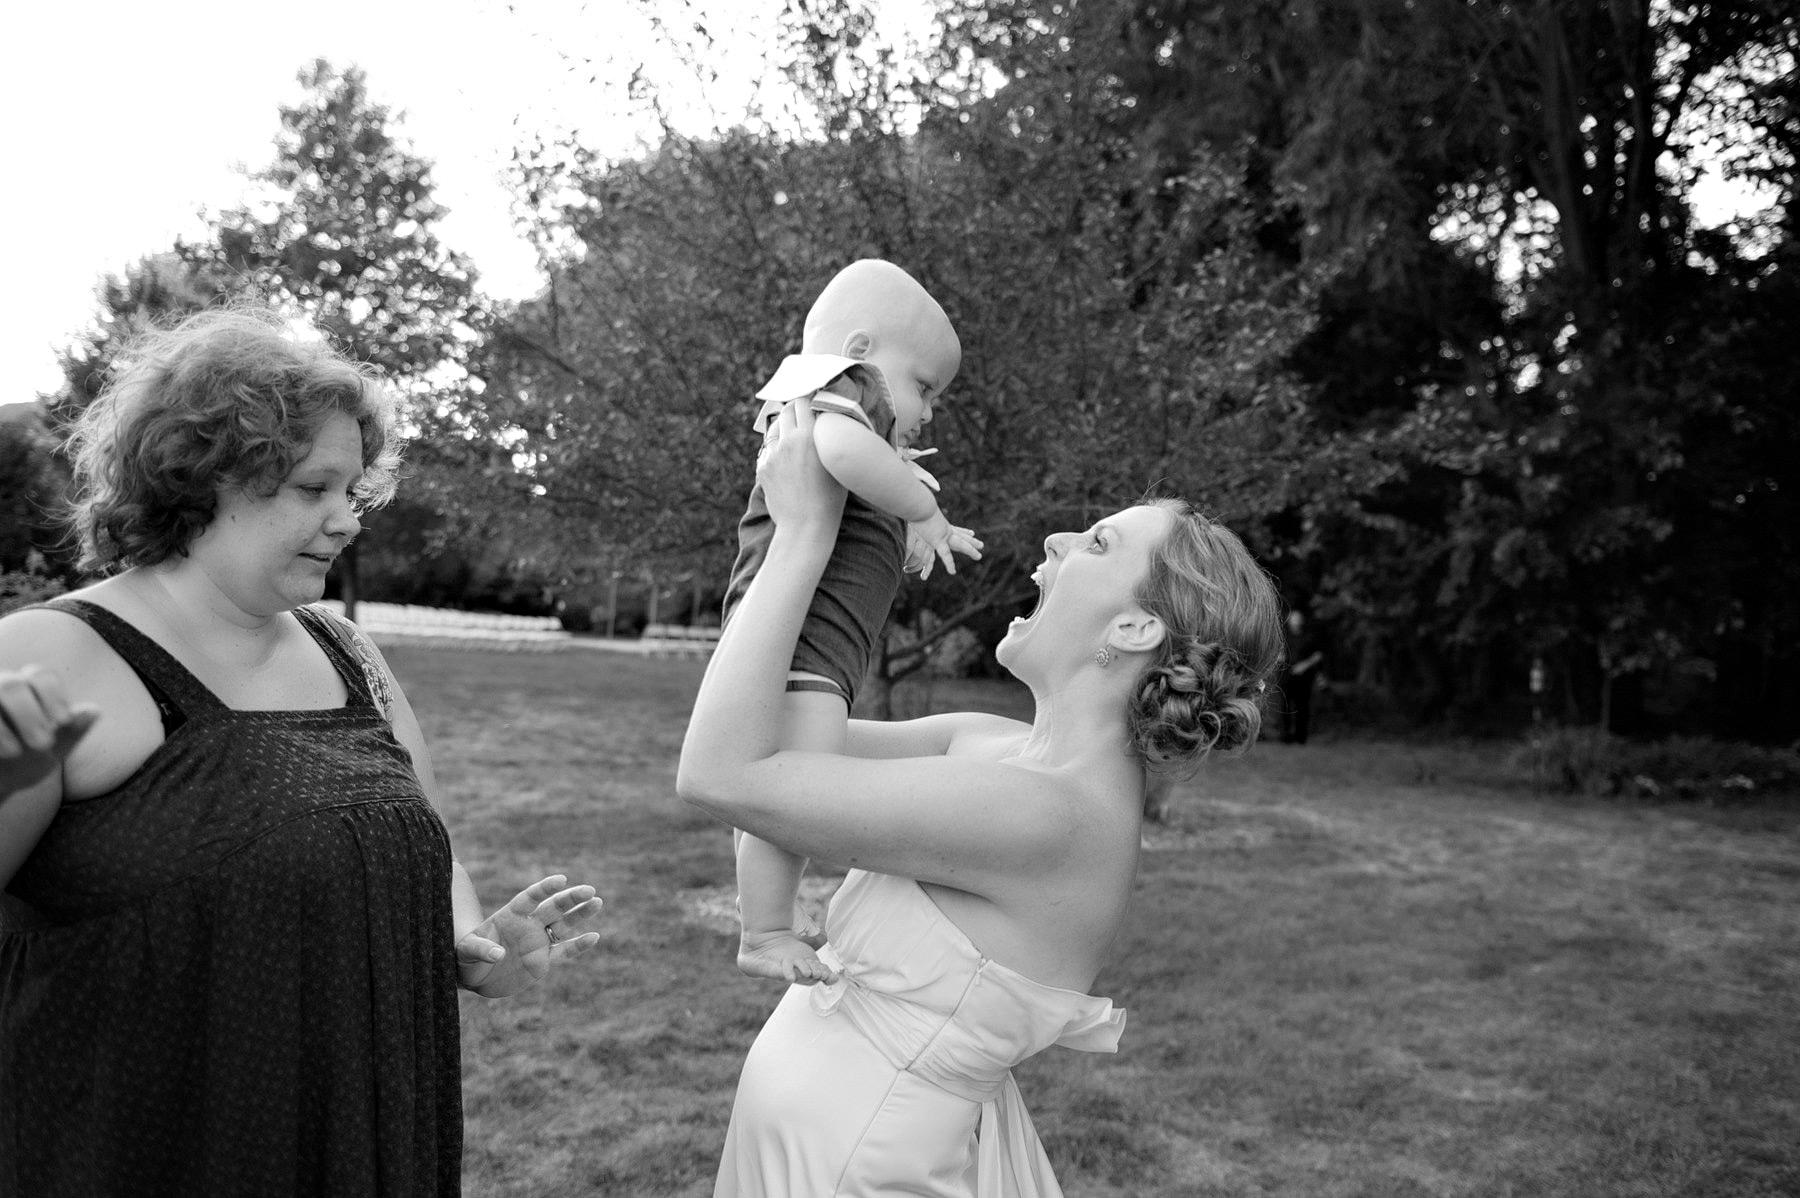 wedding-photography-saint-paul-mark-kegans-669.jpg